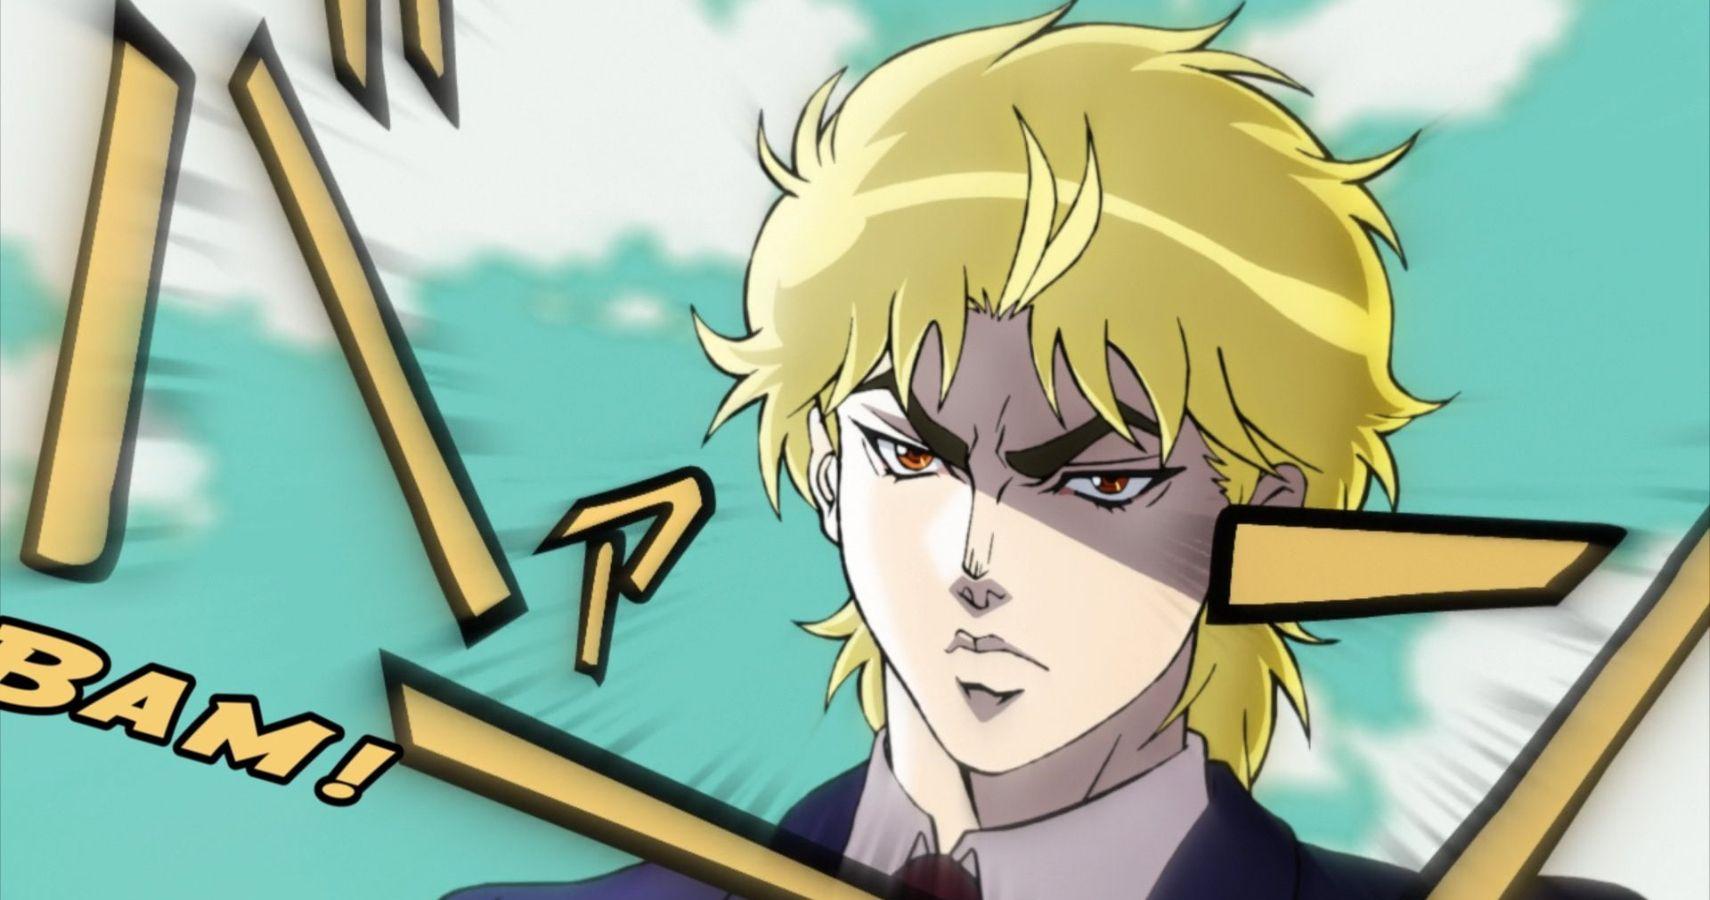 JoJo's Bizarre Adventure: The 10 Most Iconic Anime Characters Portrayed By Takehito Koyasu